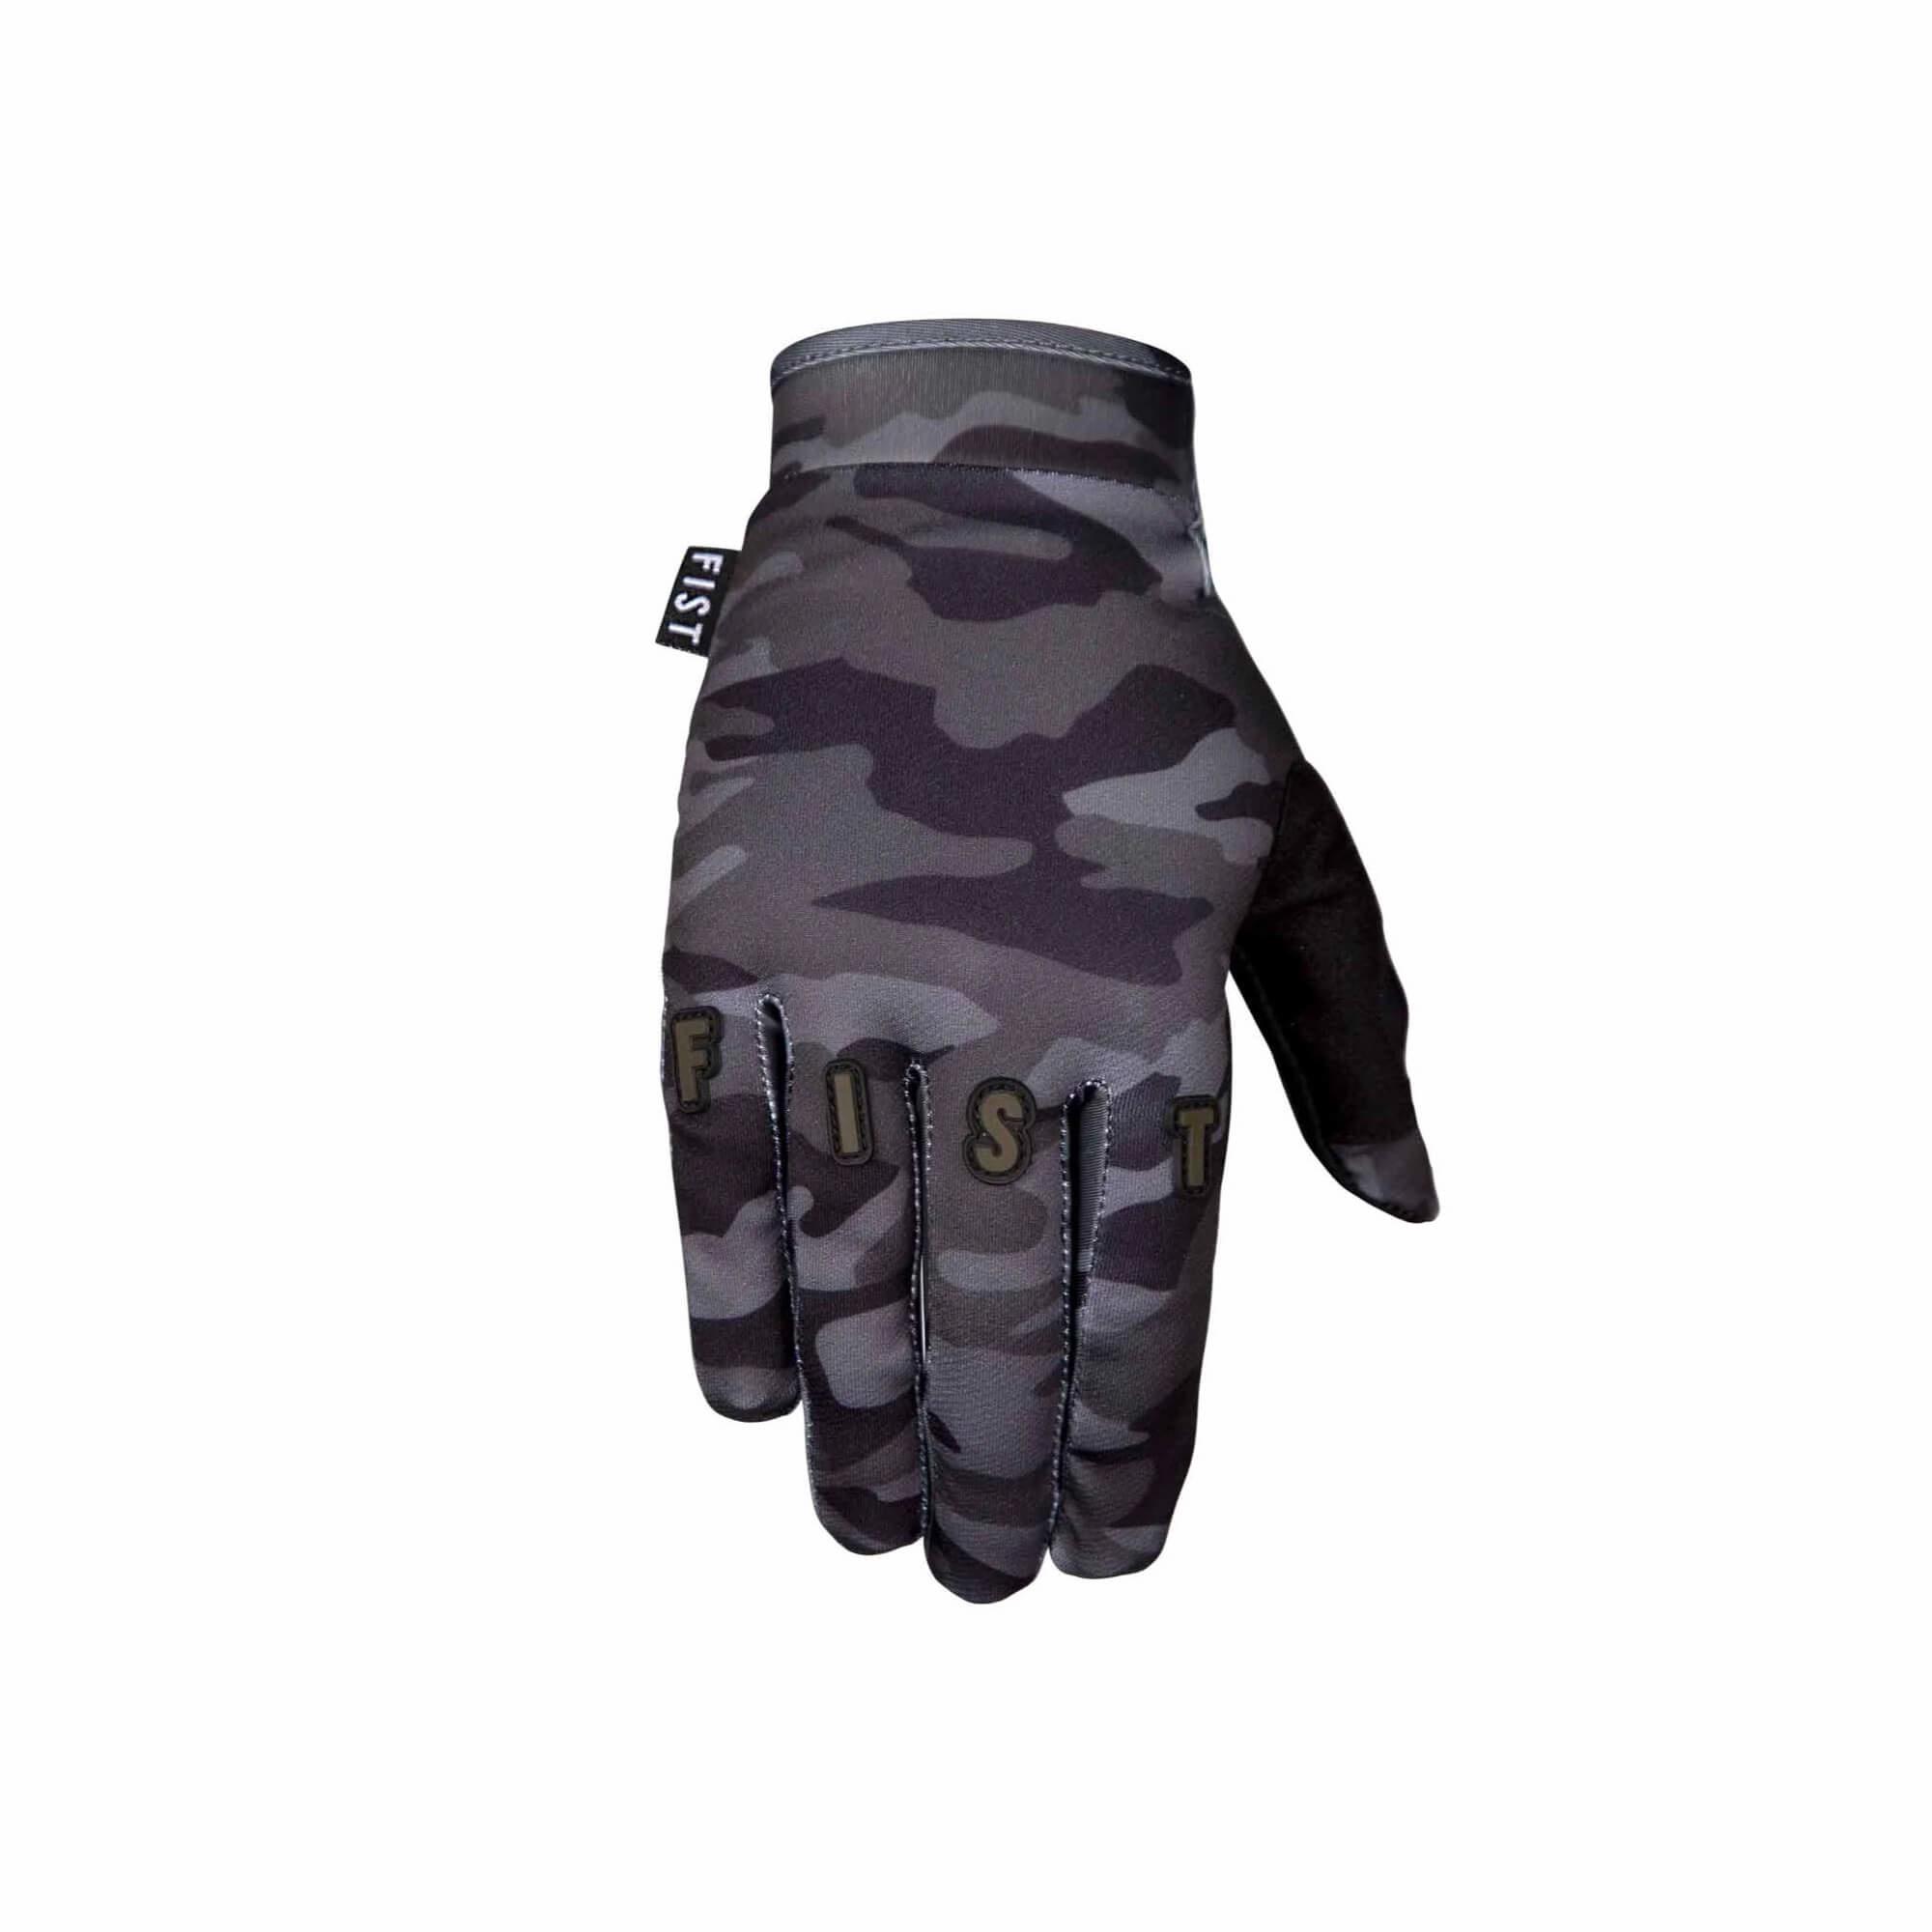 Covert Gloves Camo-1